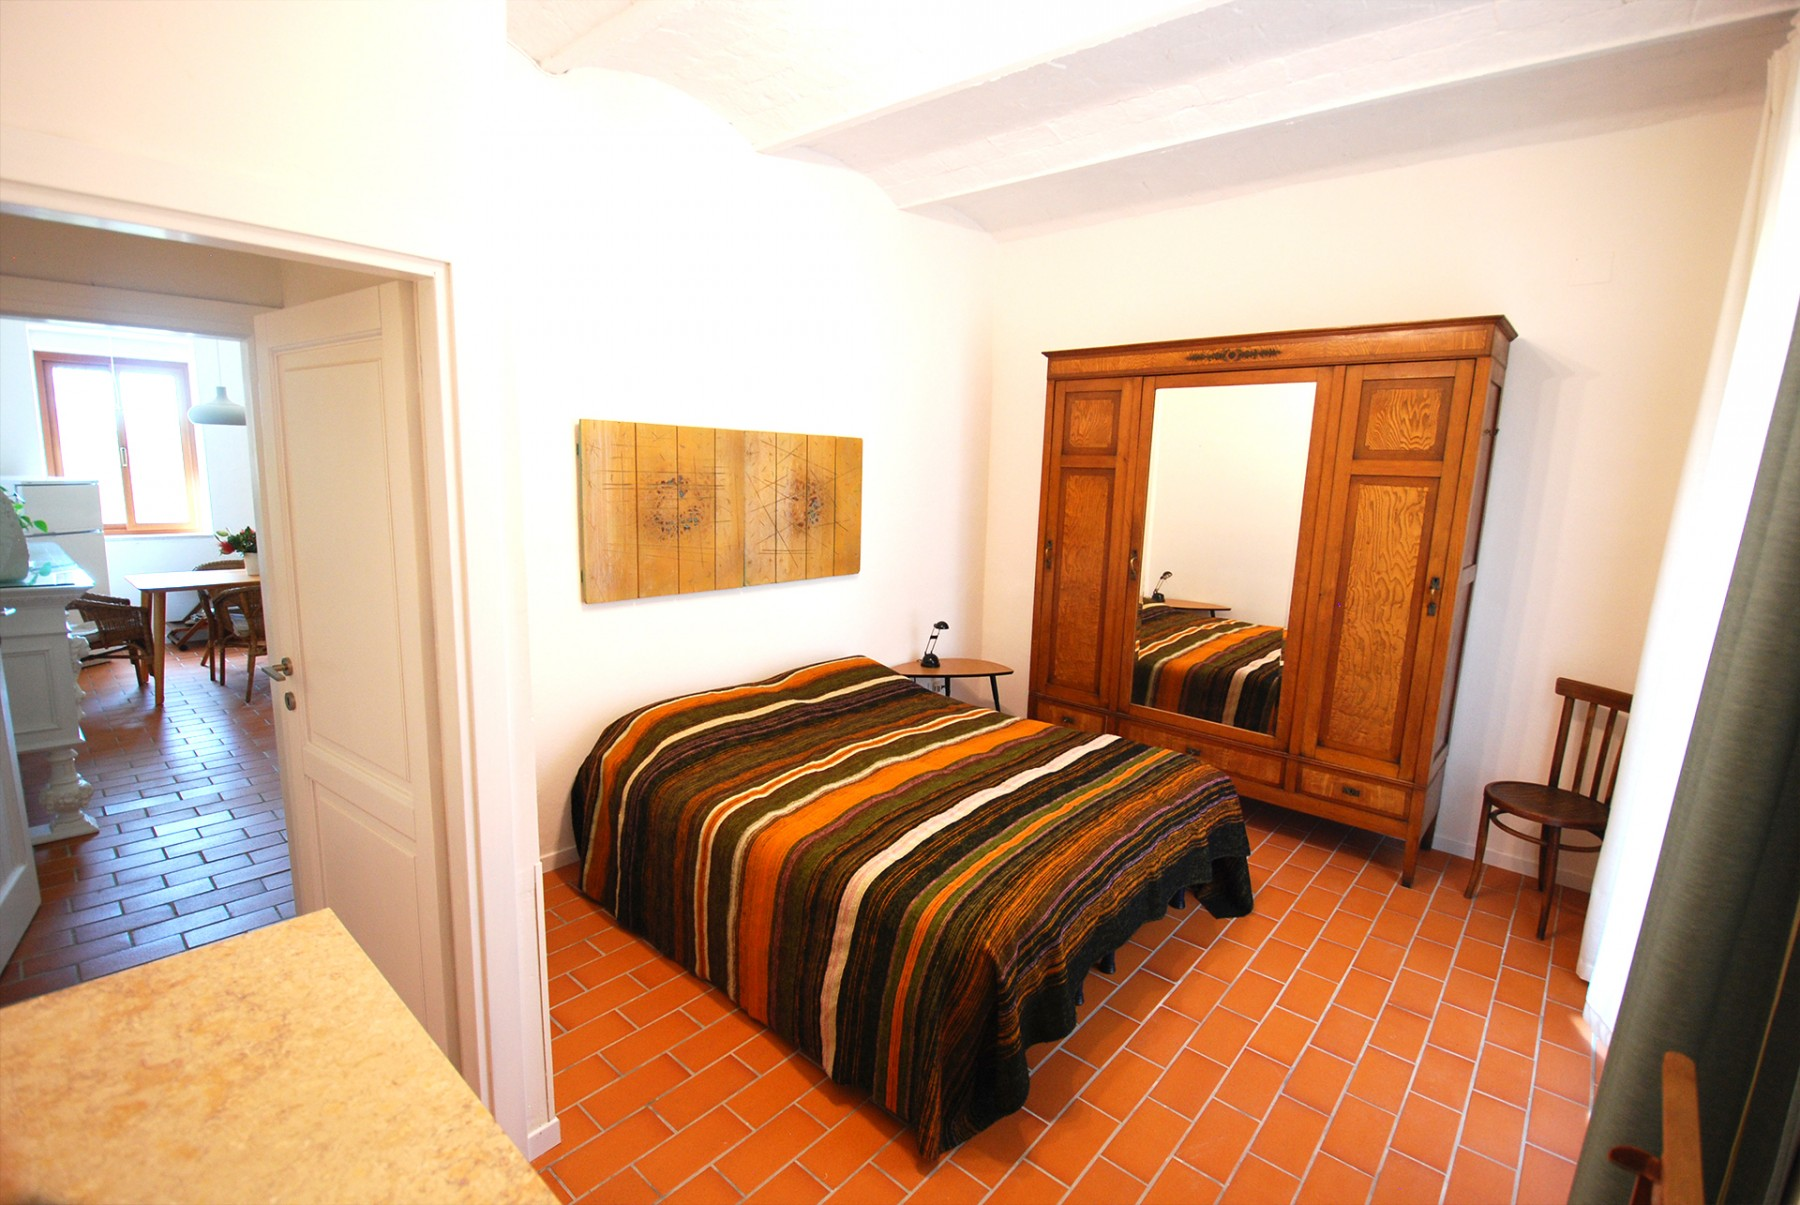 Camera Matrimoniale A Grosseto.Appartamento Tarangire Agriturismo Podere Il Leccio Toscana